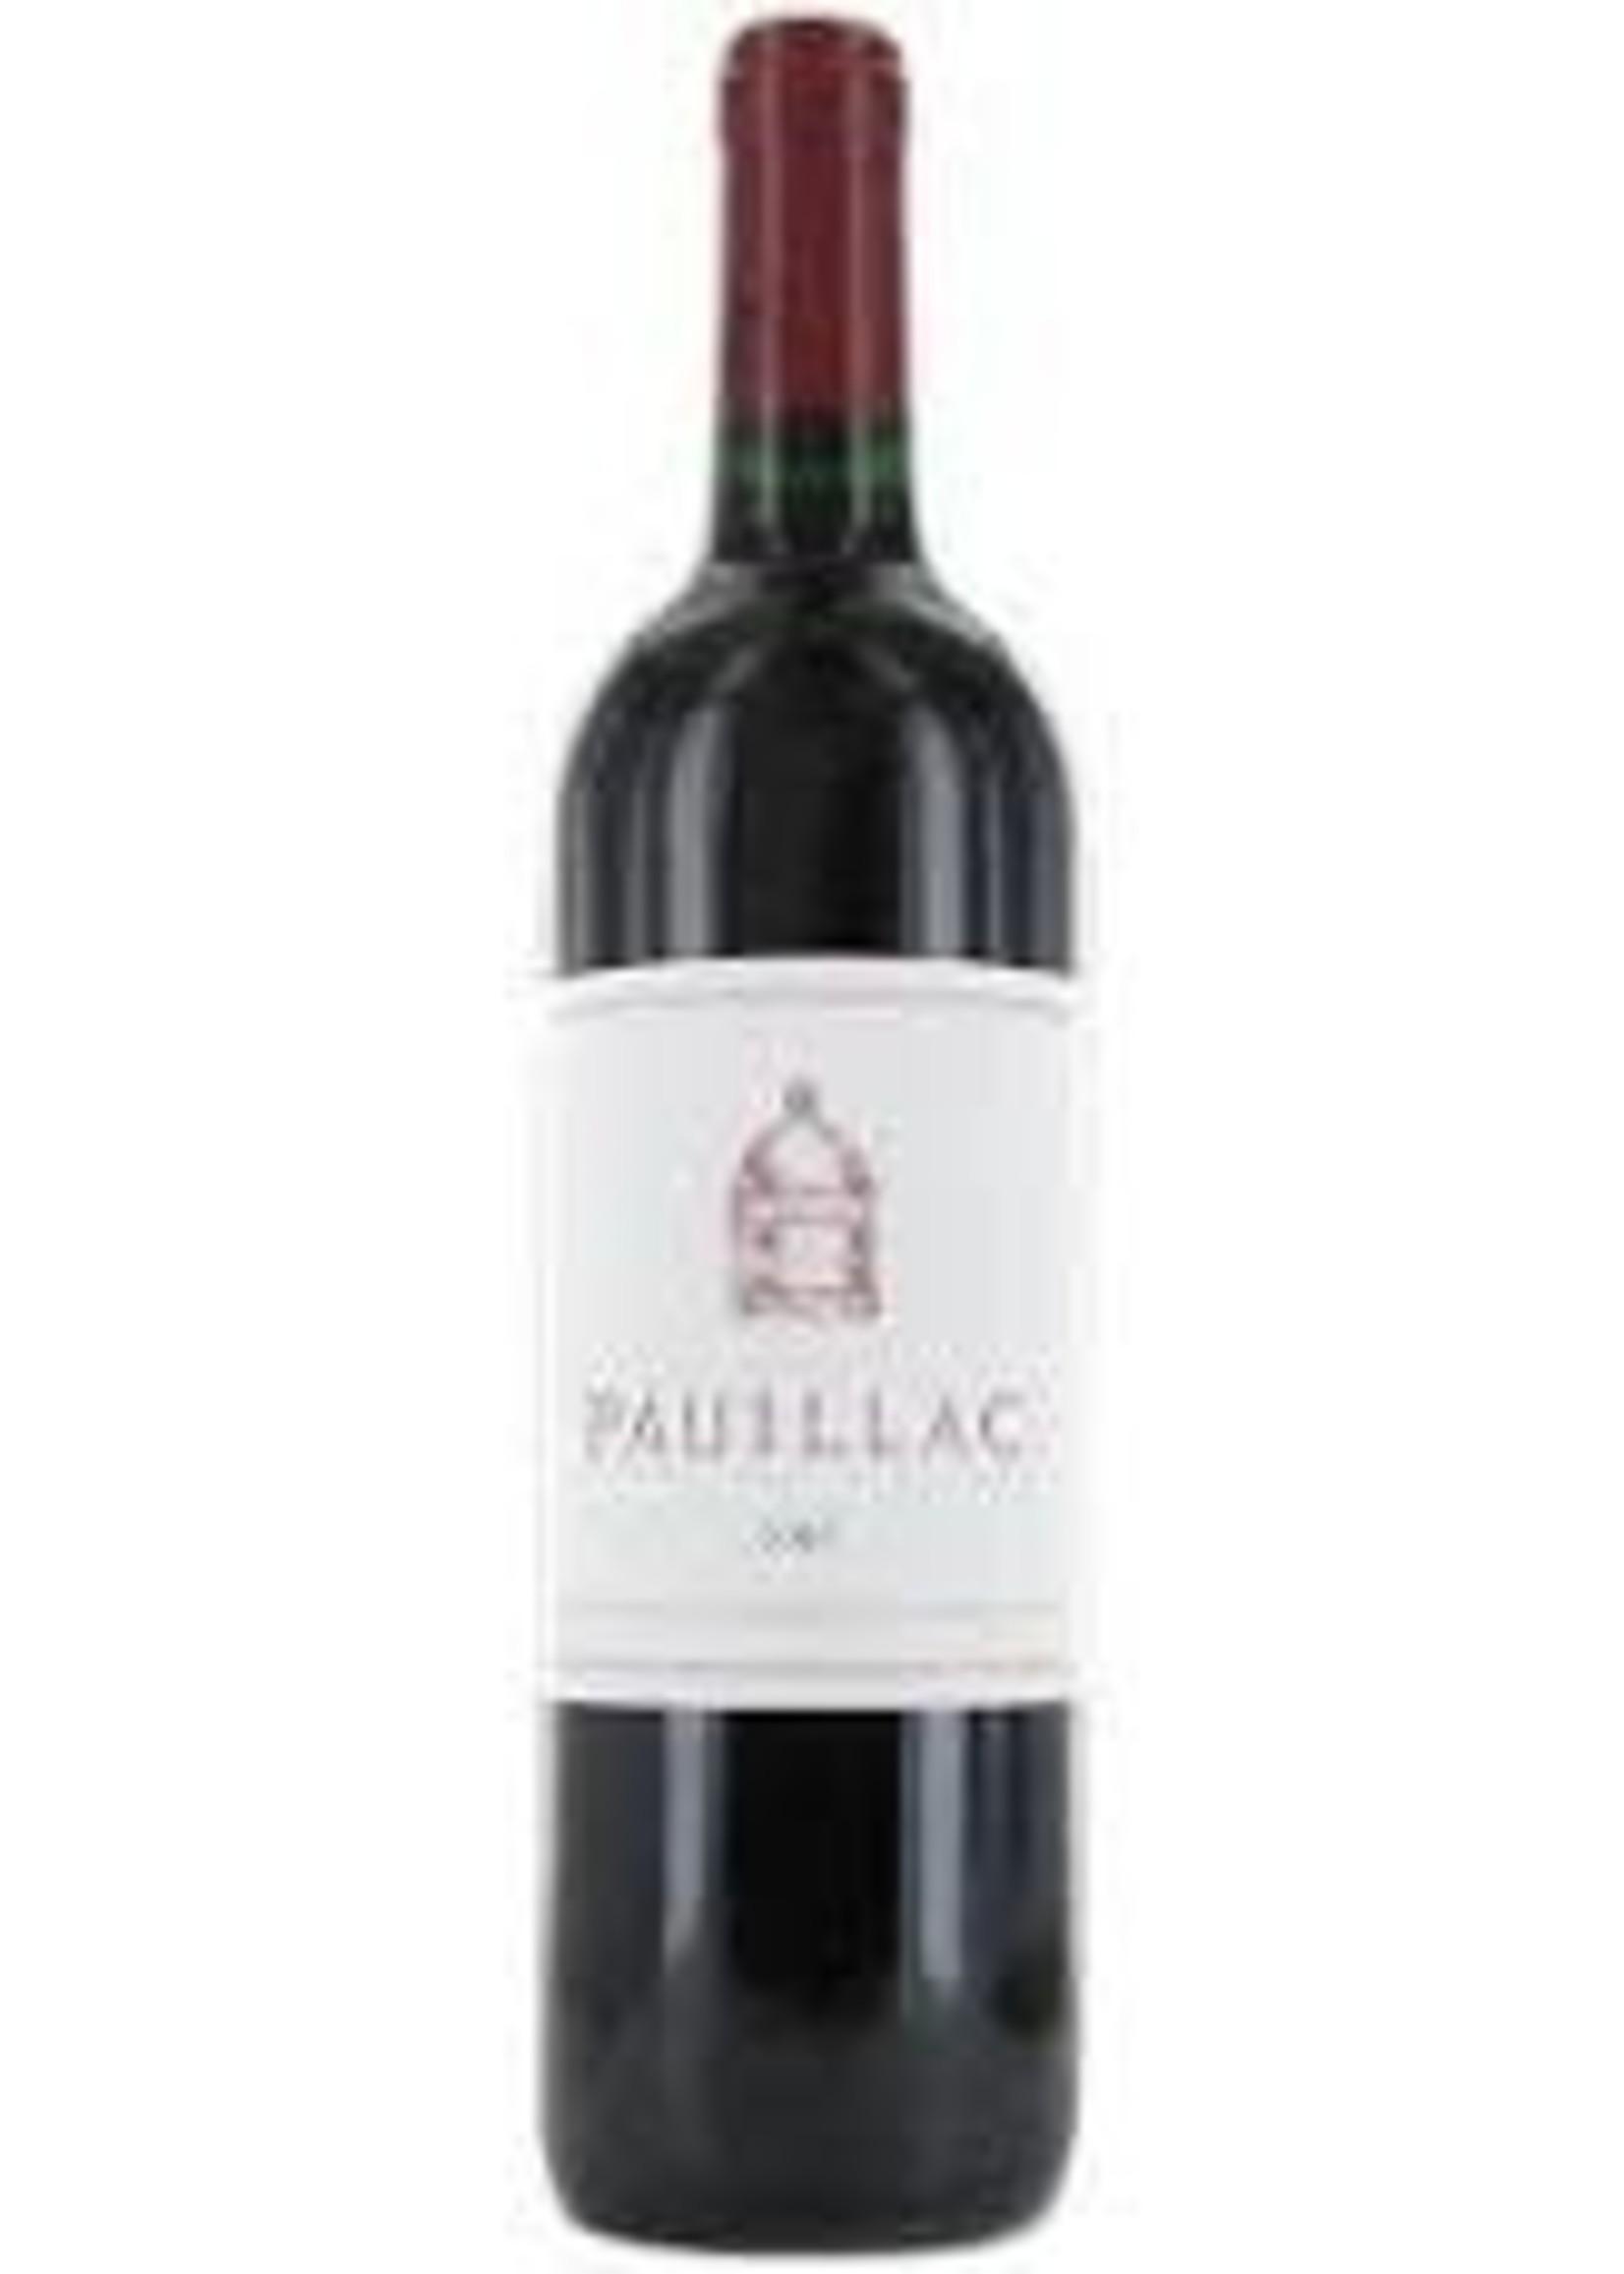 Latour de Pauillac 2014 750ml